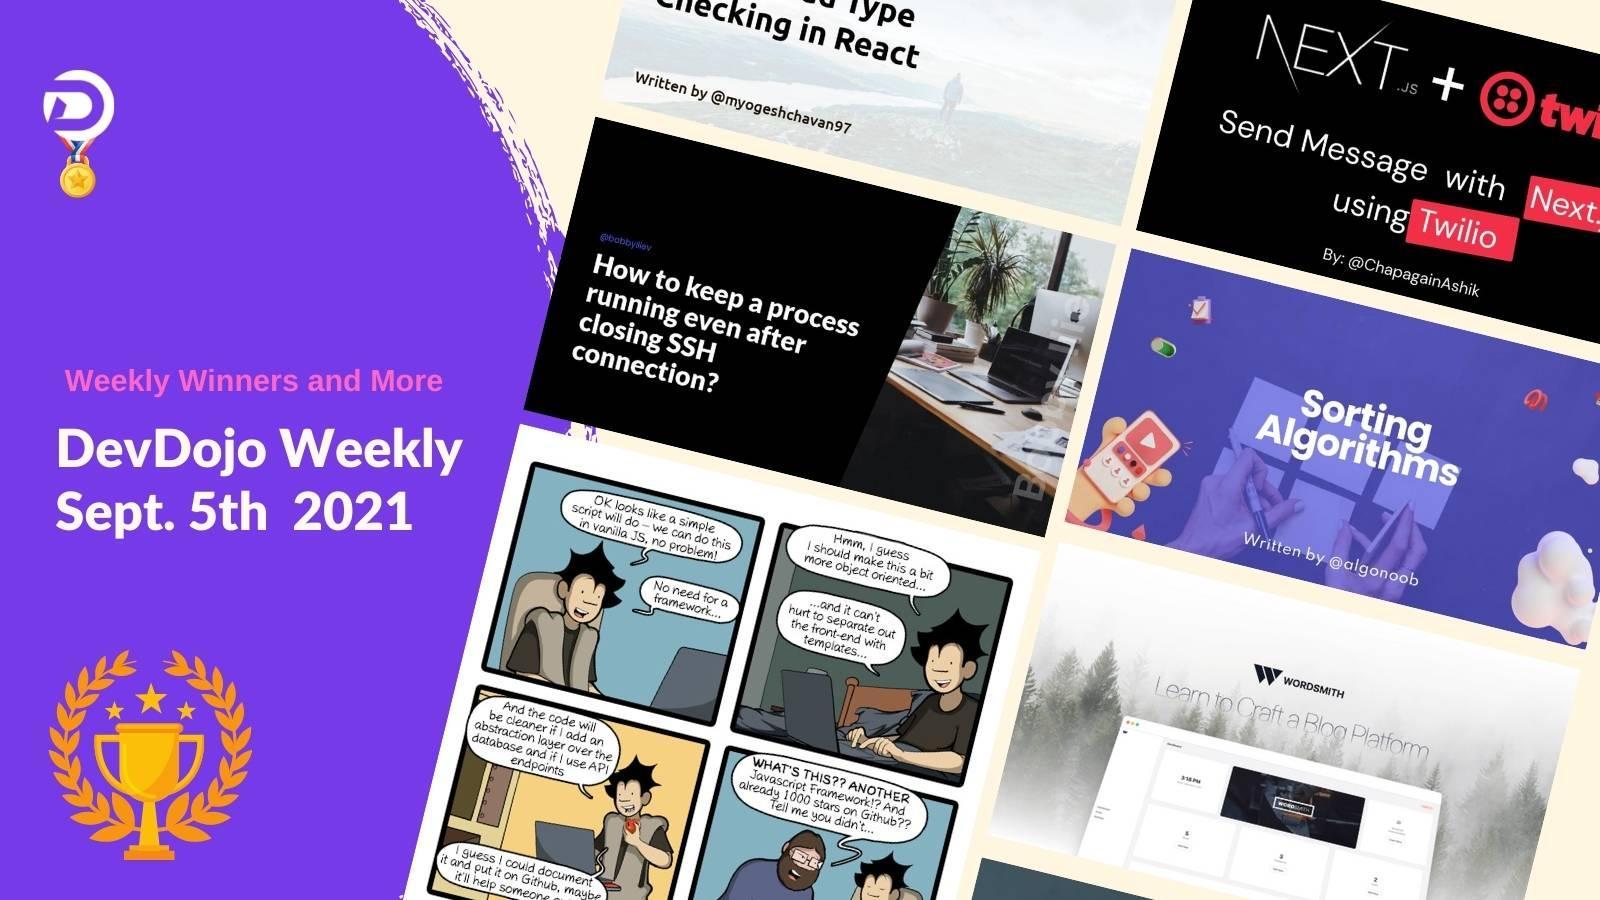 DevDojo Weekly - Sept. 5th  2021